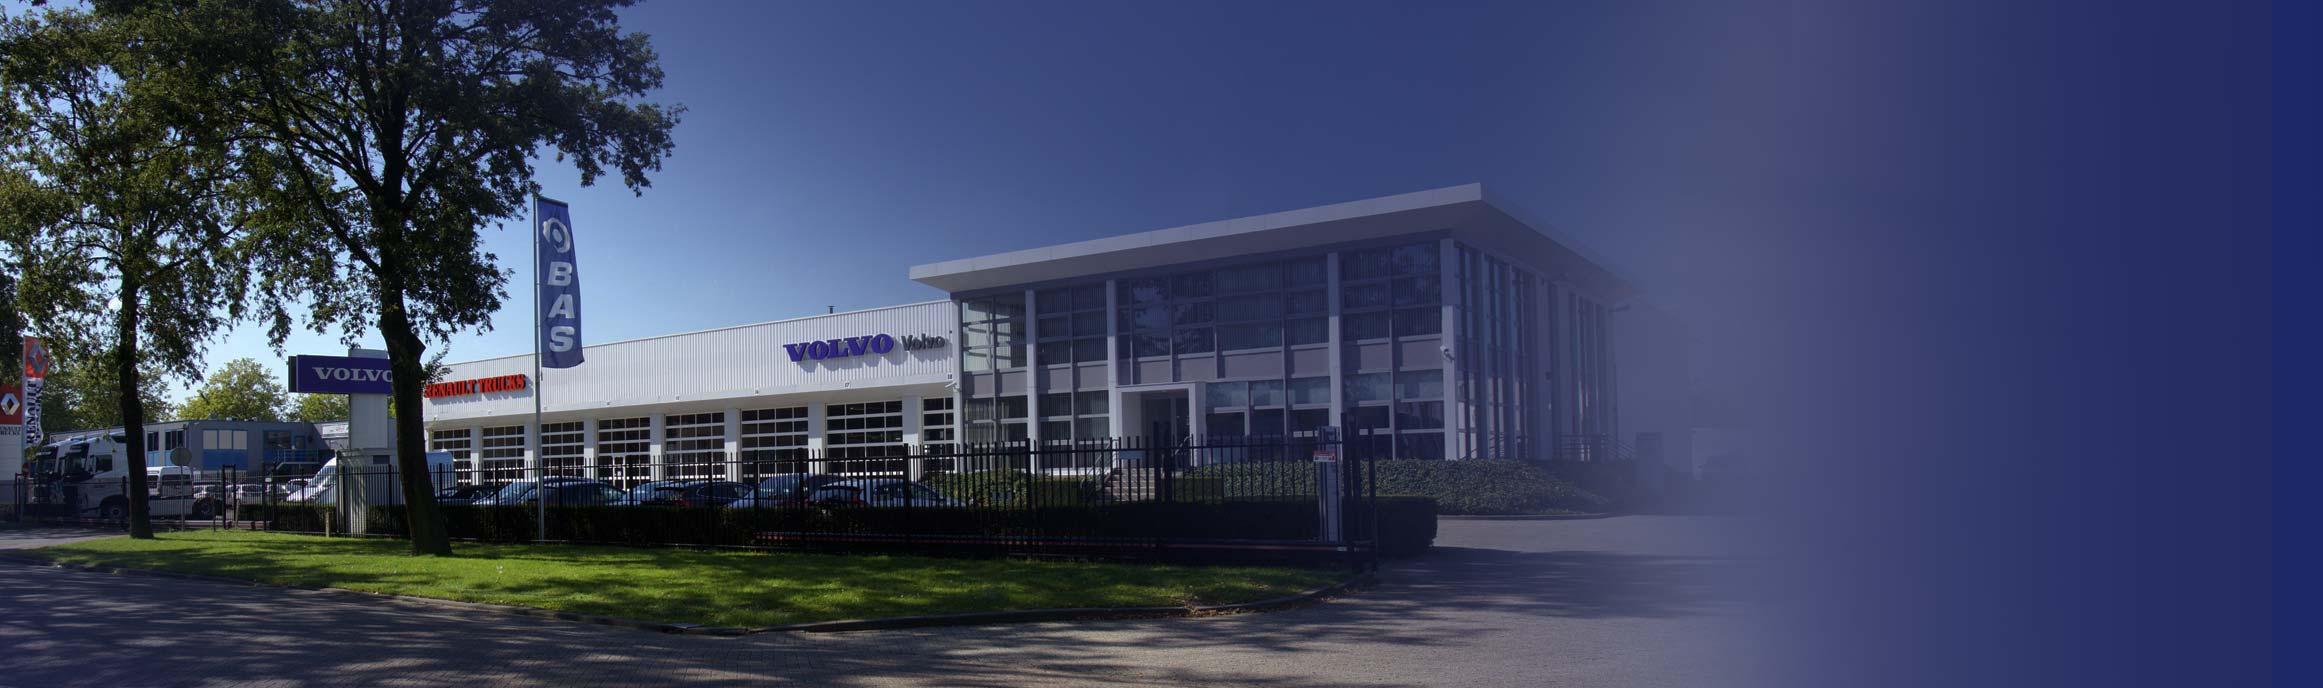 BAS Truck Center vestiging Tilburg